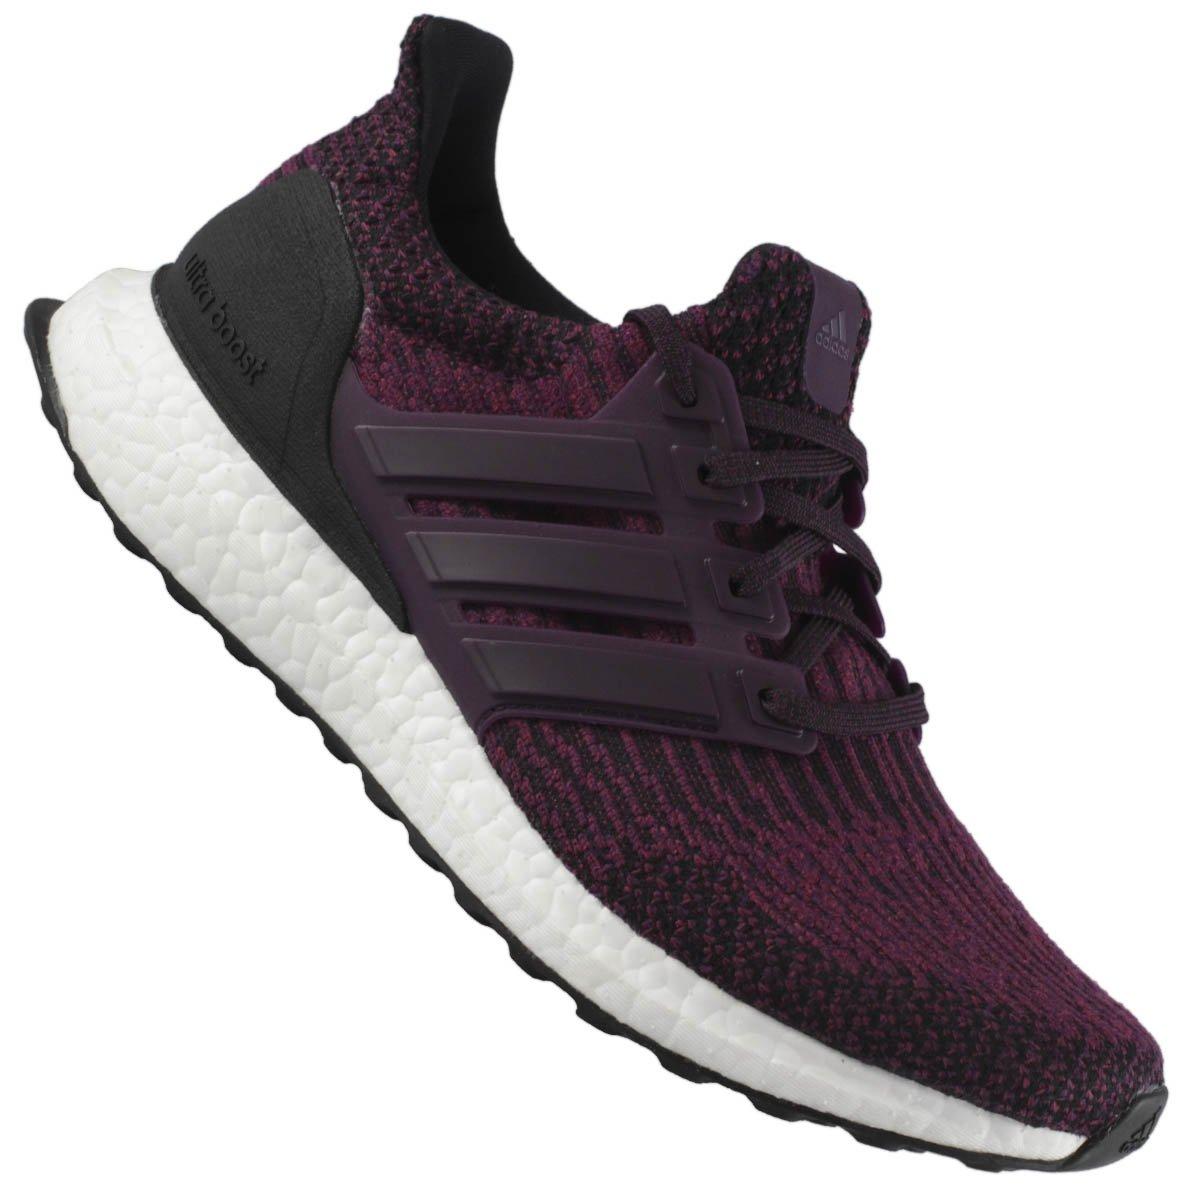 5d07e9eab Tênis Adidas Ultraboost Feminino